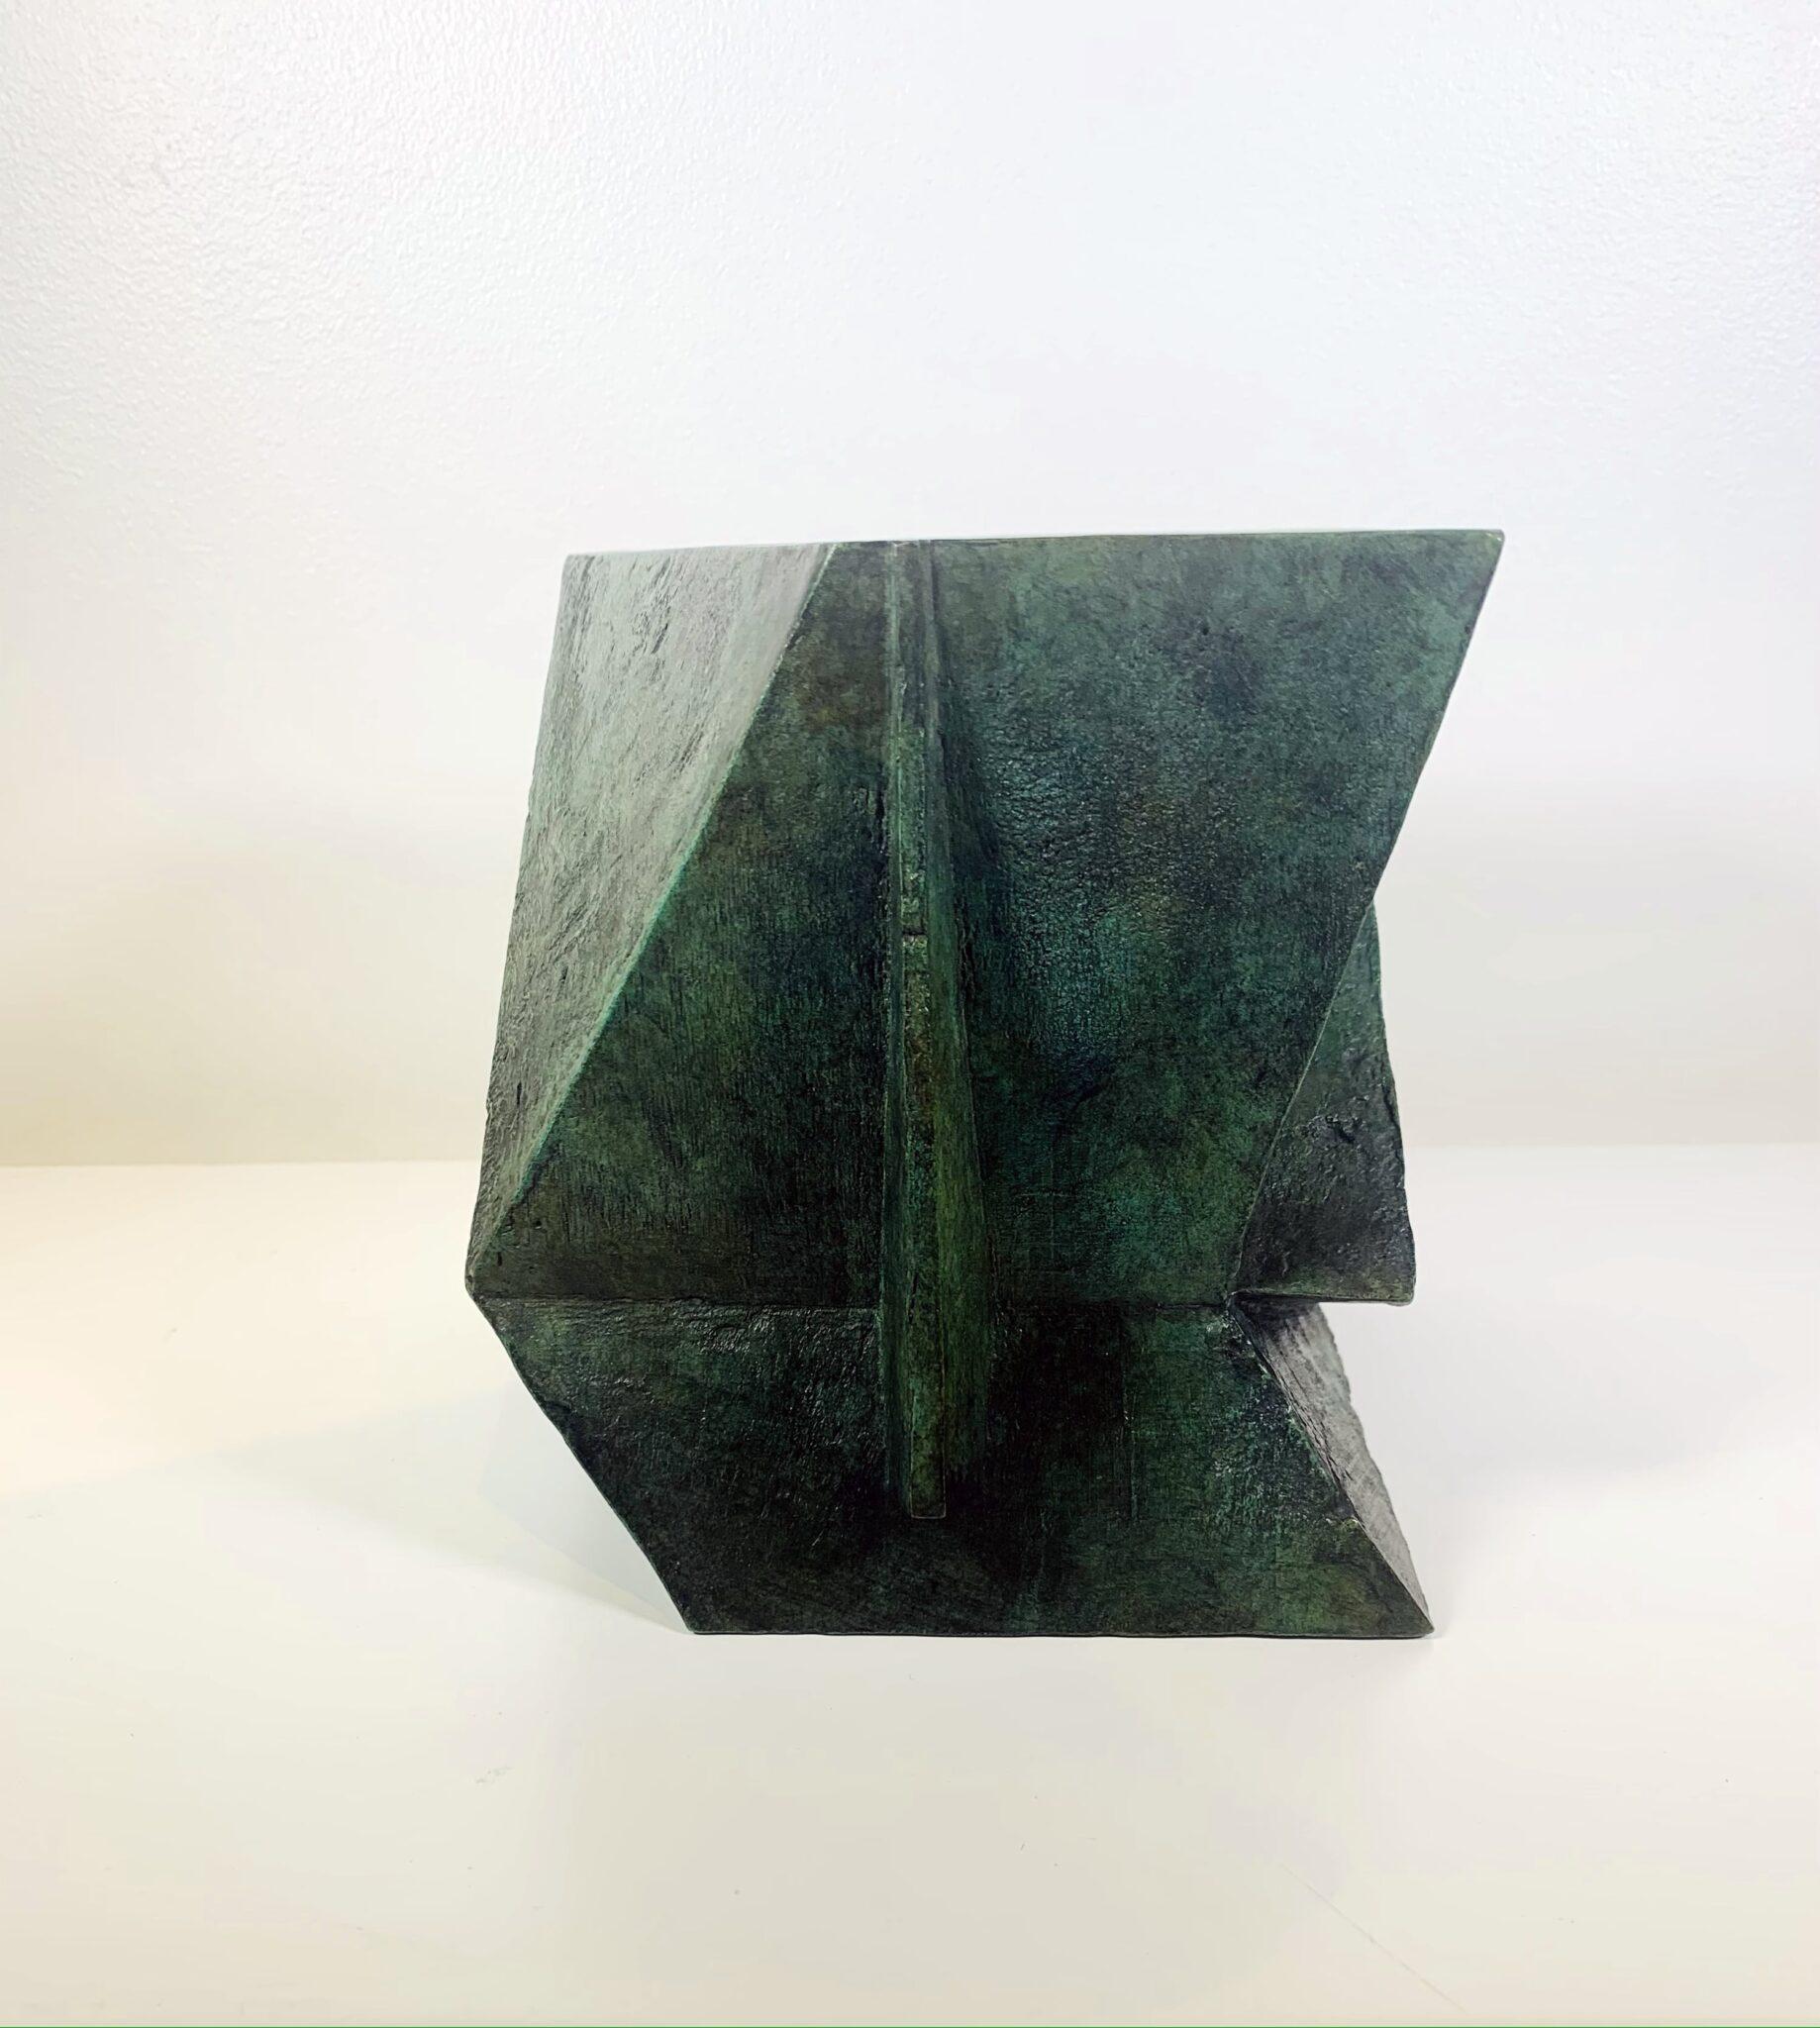 hatchikian-gallery-steph-cop-fragment-vert-bronze-2